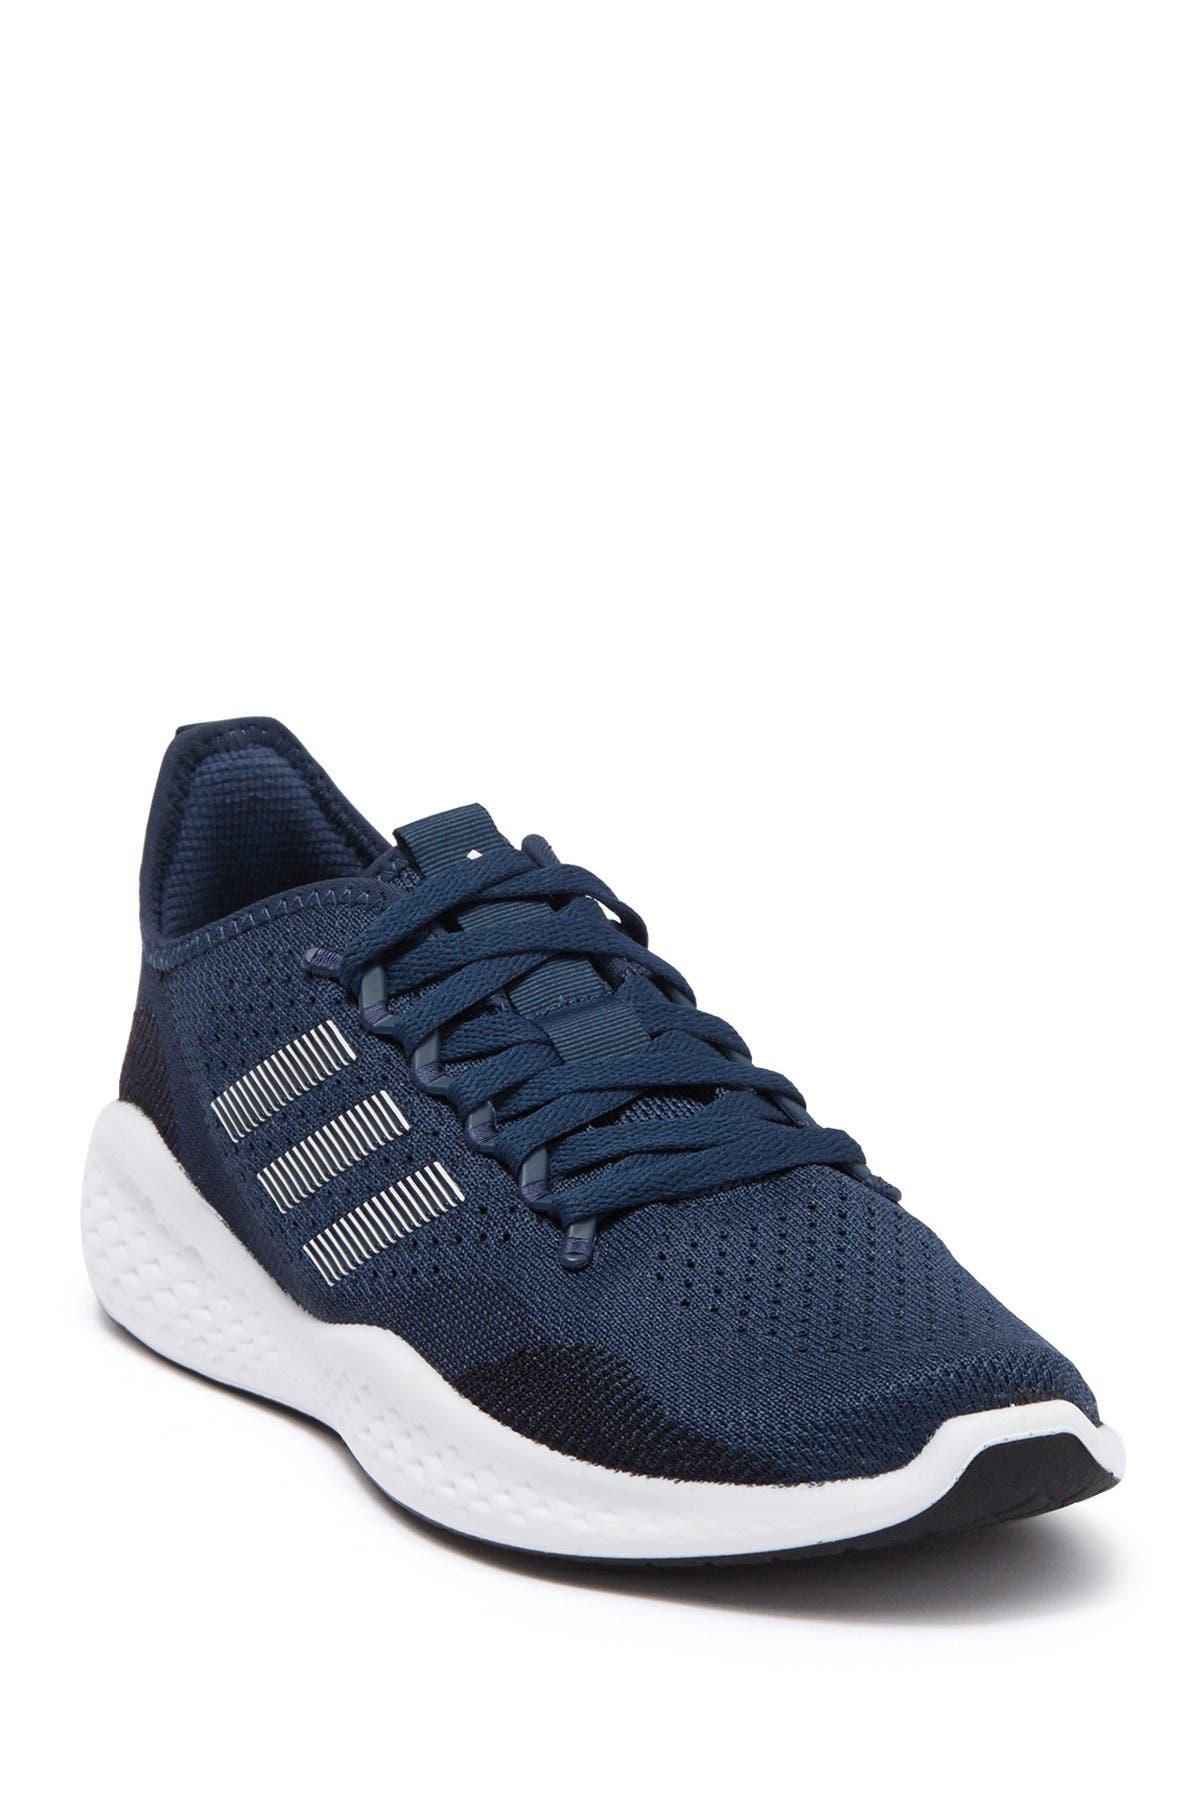 Image of adidas Fluidflow 2-0 Sneaker